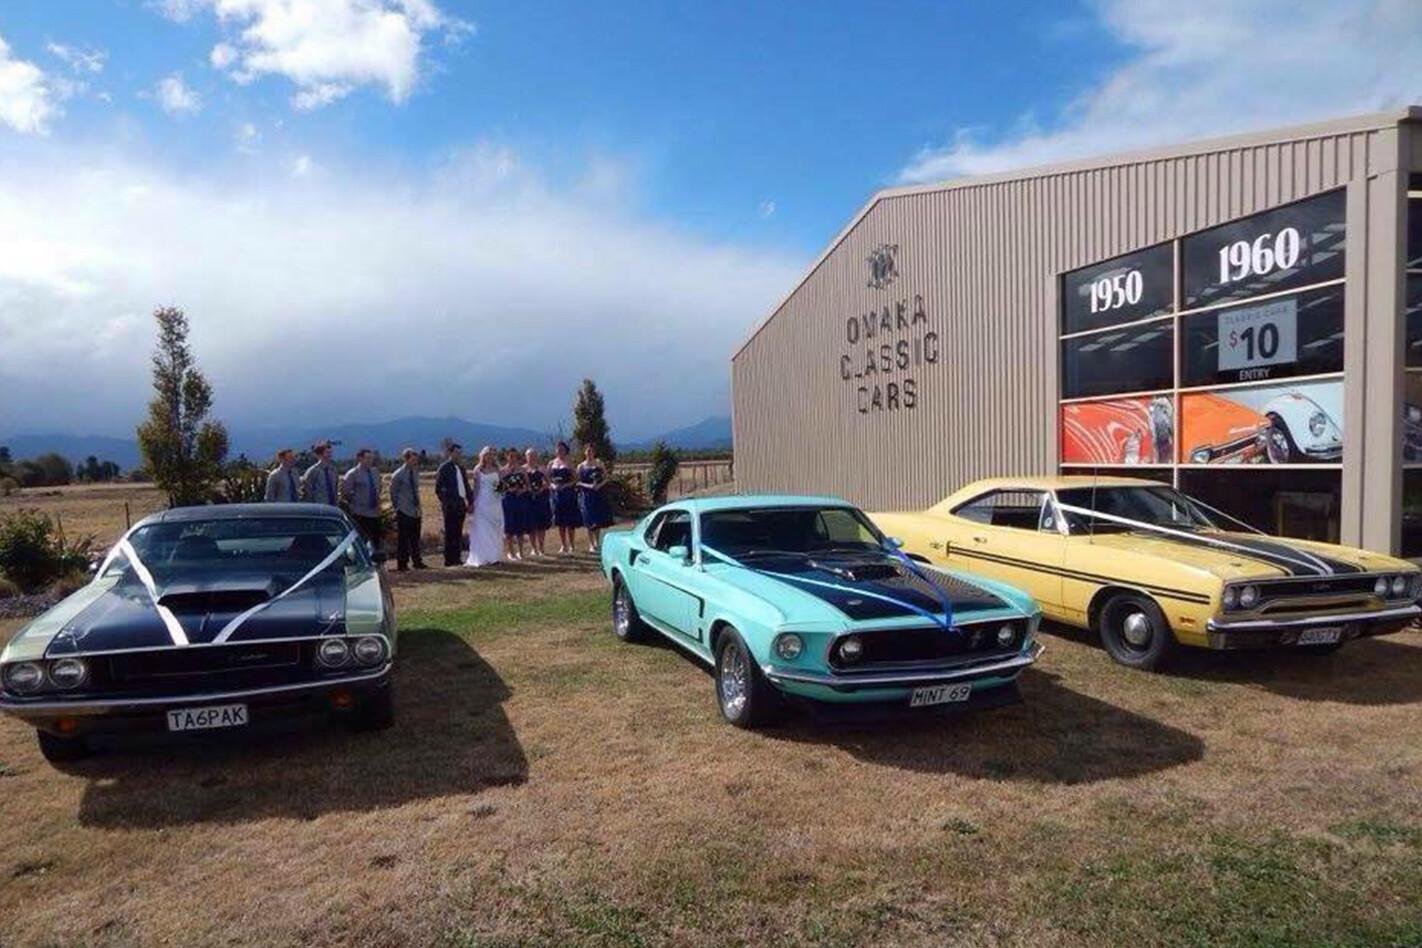 Adam Beaumont's wedding cars